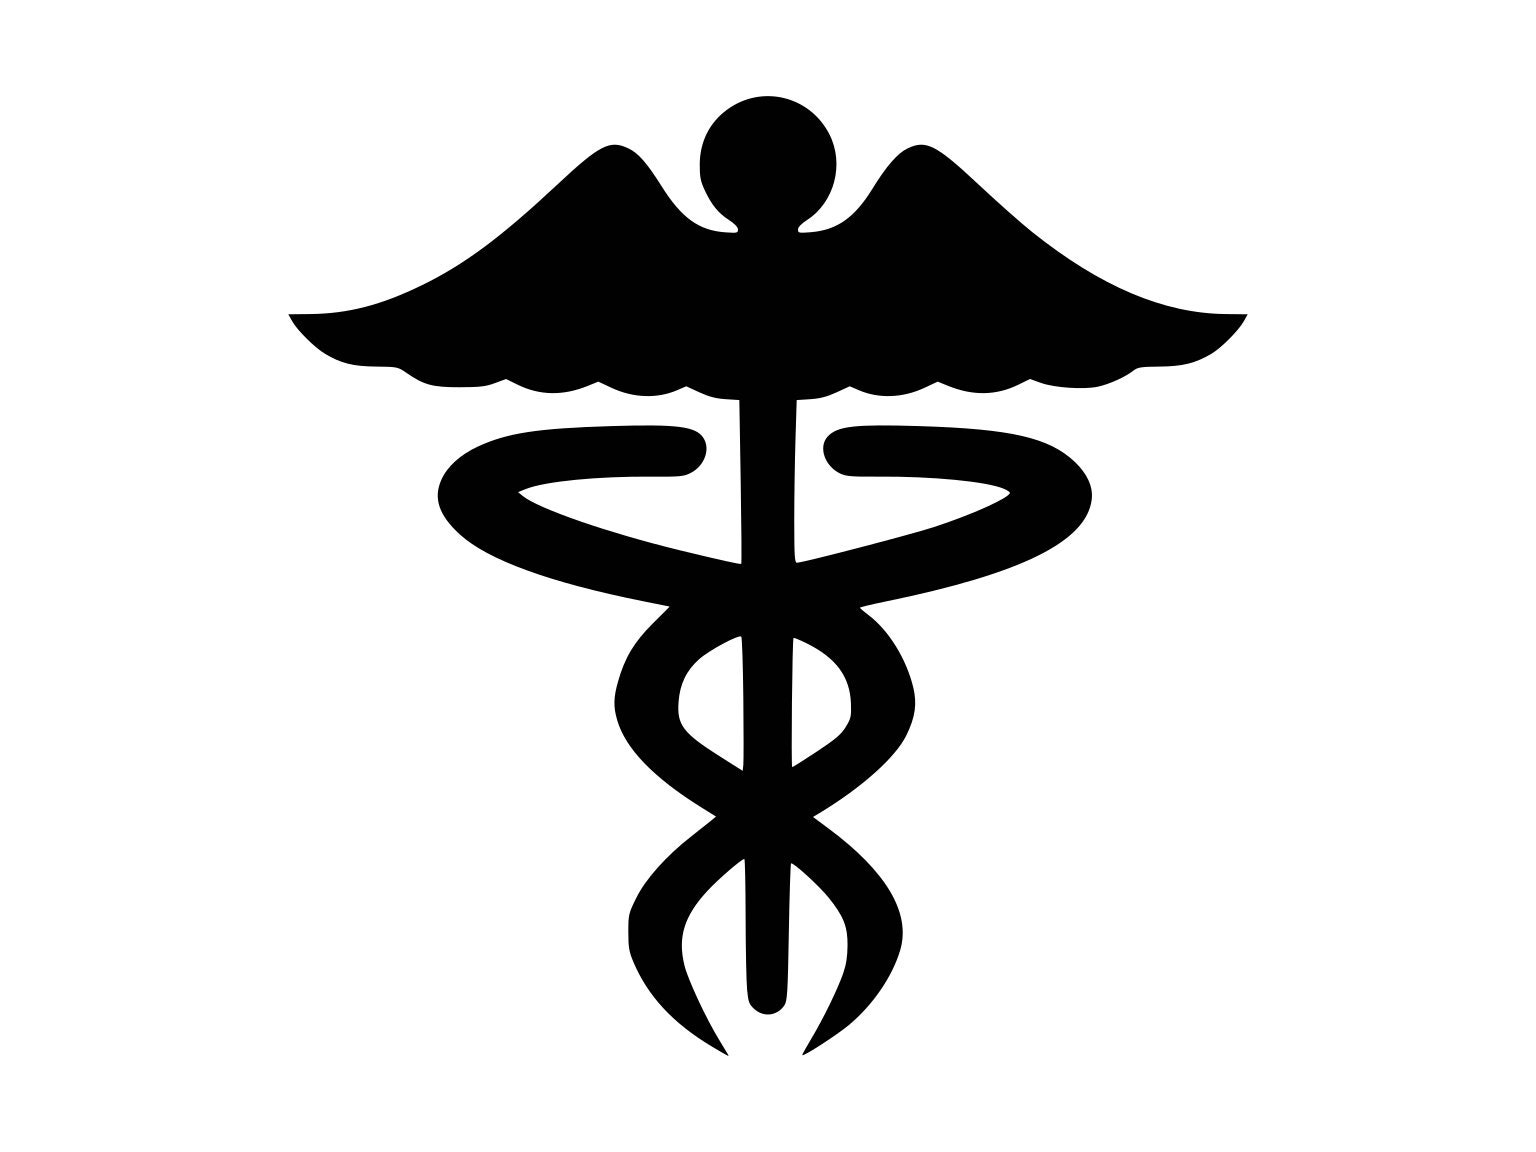 Caduceus Svg Medical Symbol Doctor Rn Medical Svg Caduceus Etsy